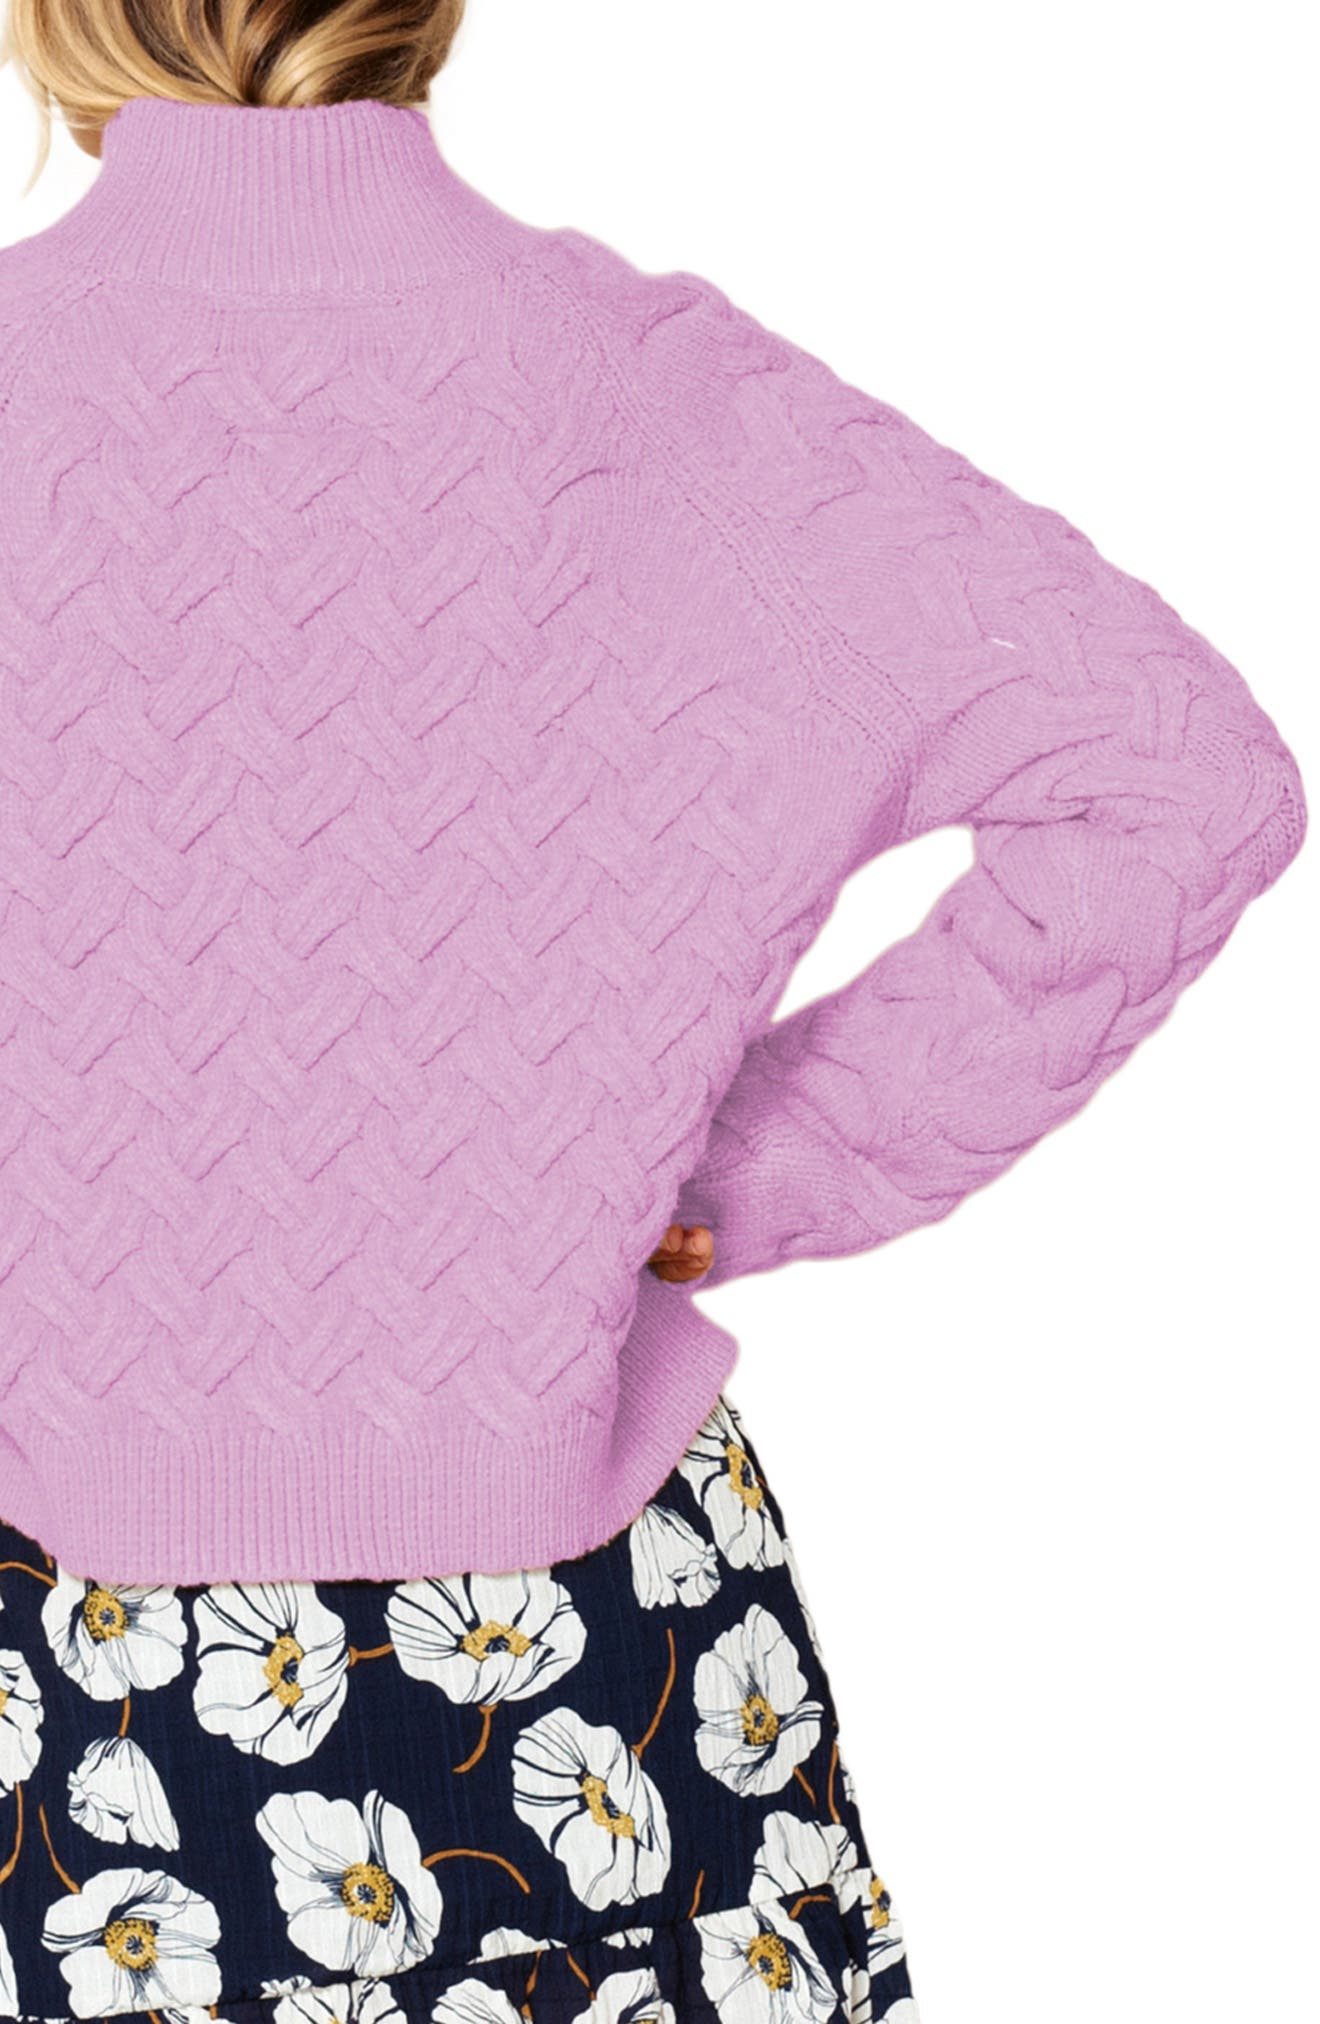 Adele Turtleneck Sweater,                             Alternate thumbnail 2, color,                             534